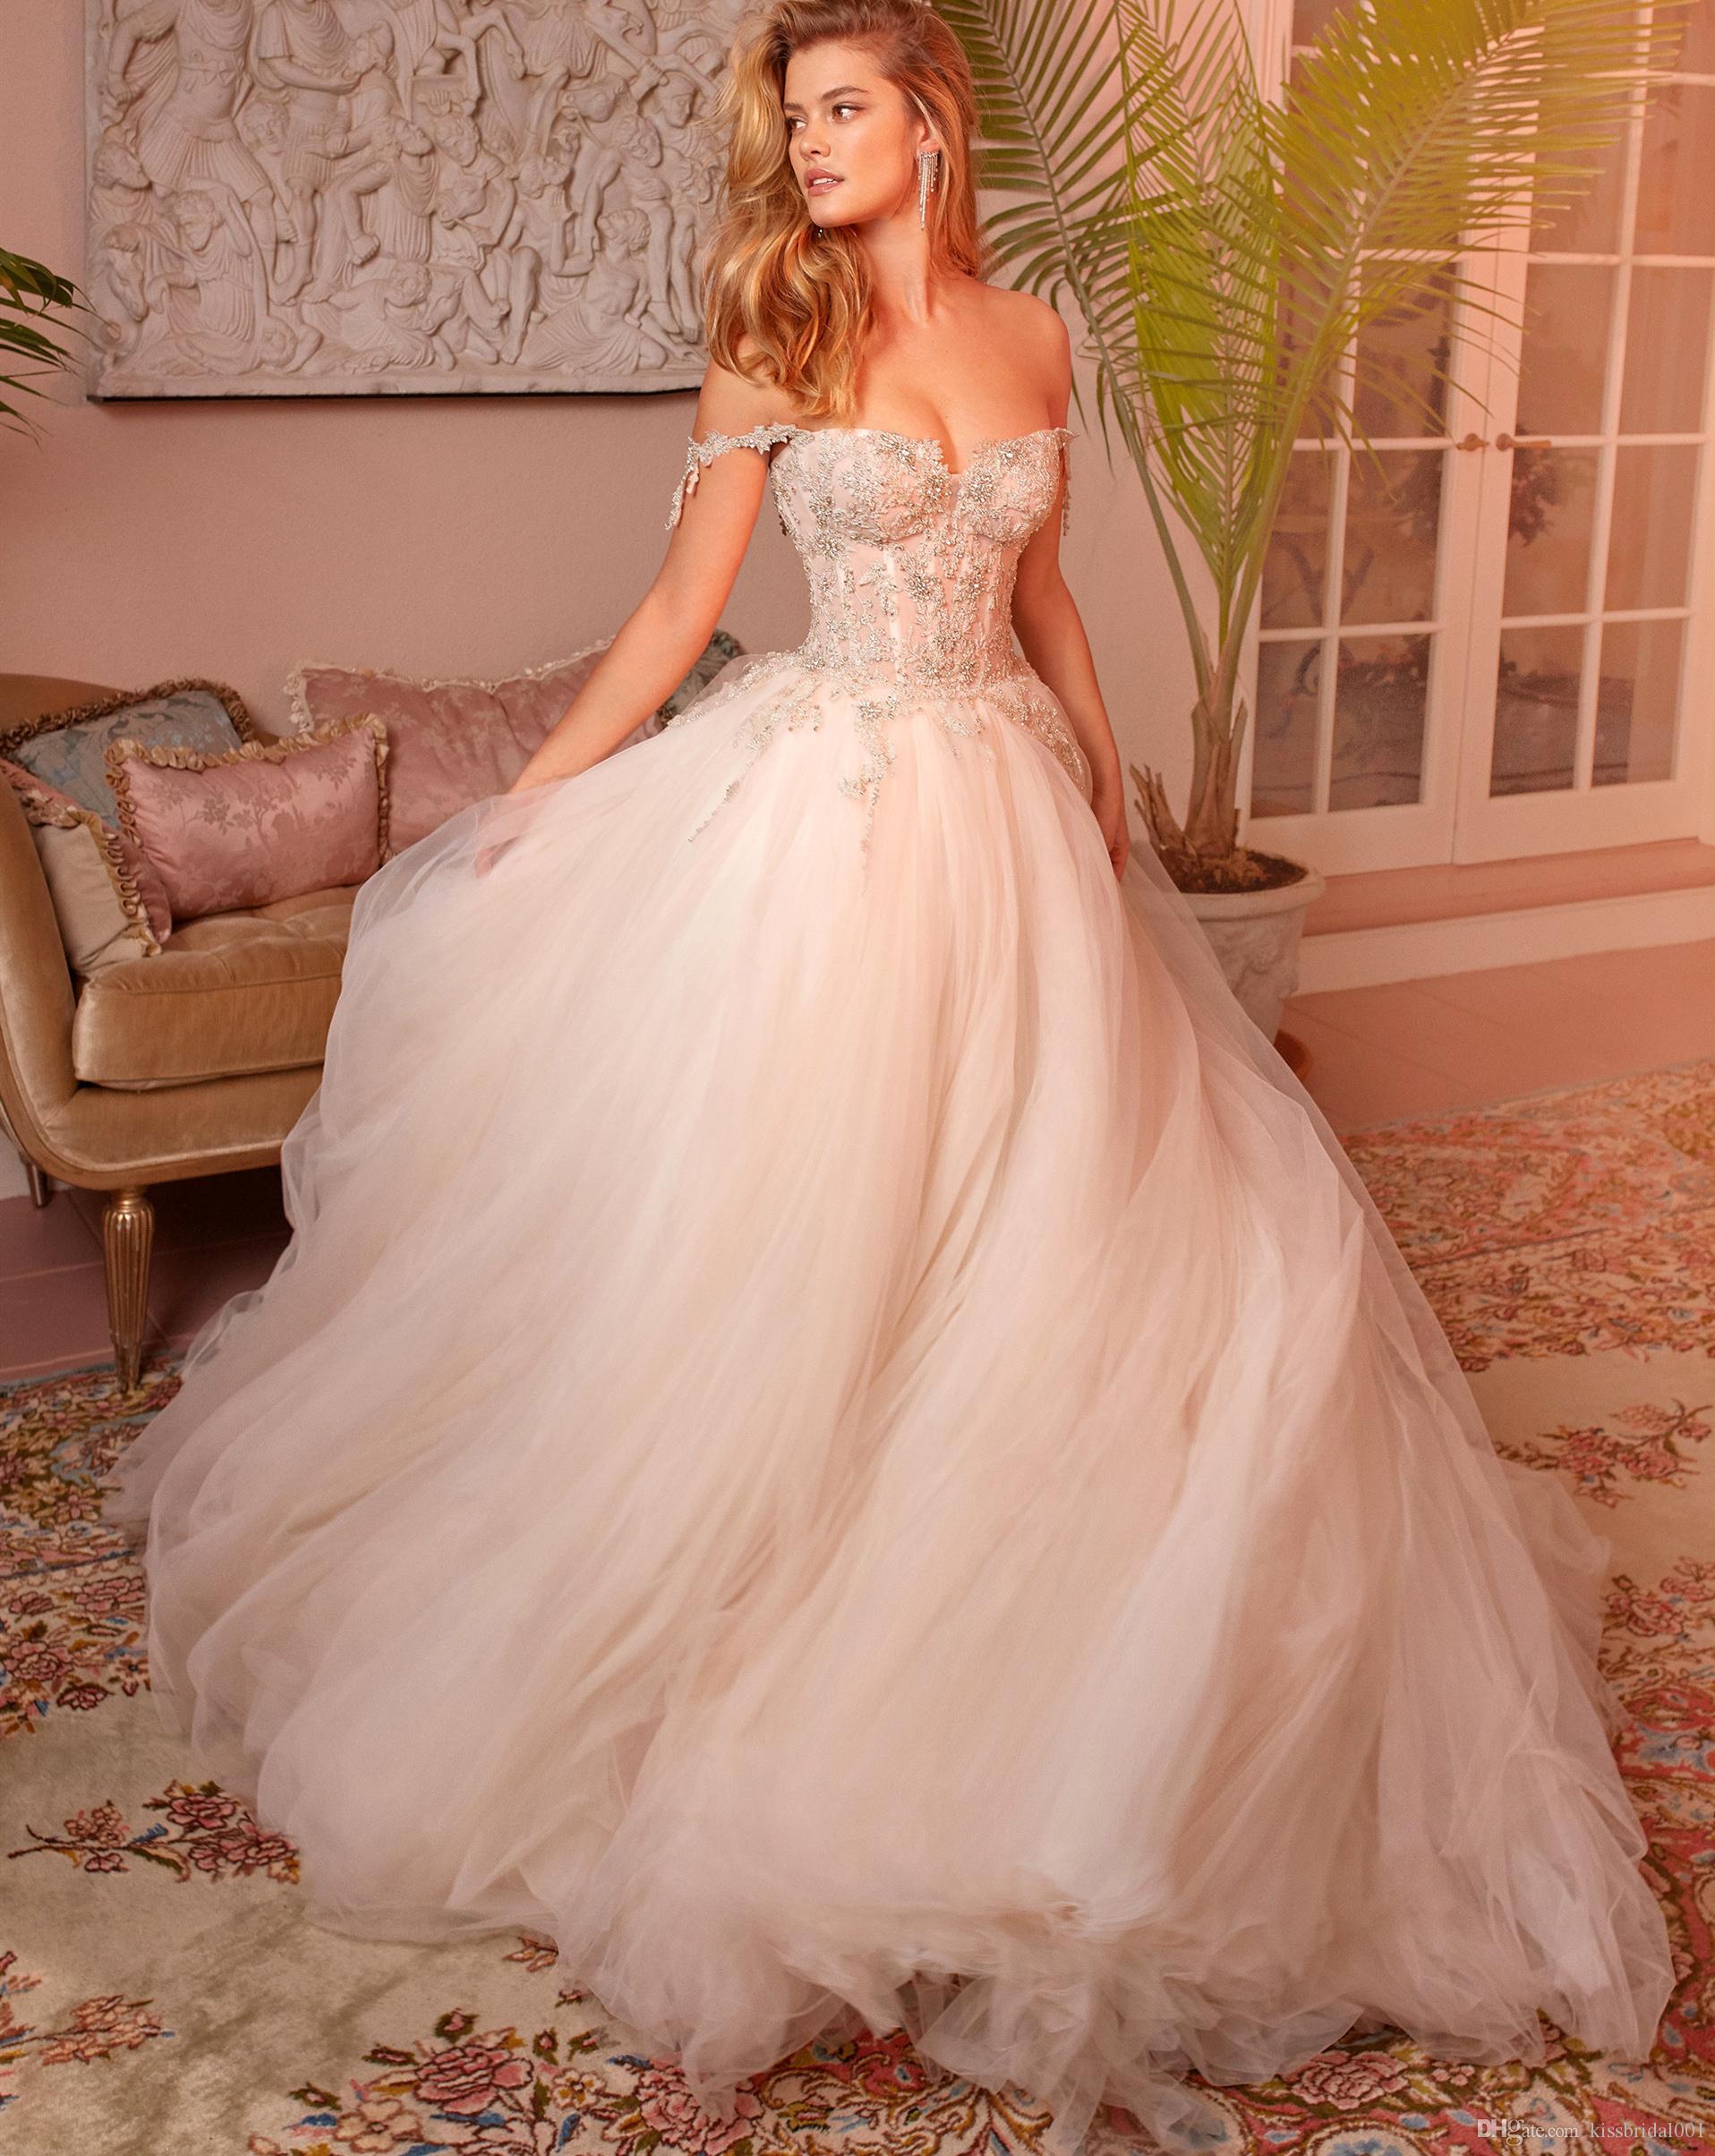 8f918778ffe Discount Off The Shoulder Corset Wedding Dresses Vestido De Novia Beaded Lace  Wedding Dress Tulle Bridal Gowns A Line Wedding Dresses Sweetheart Neckline  A ...